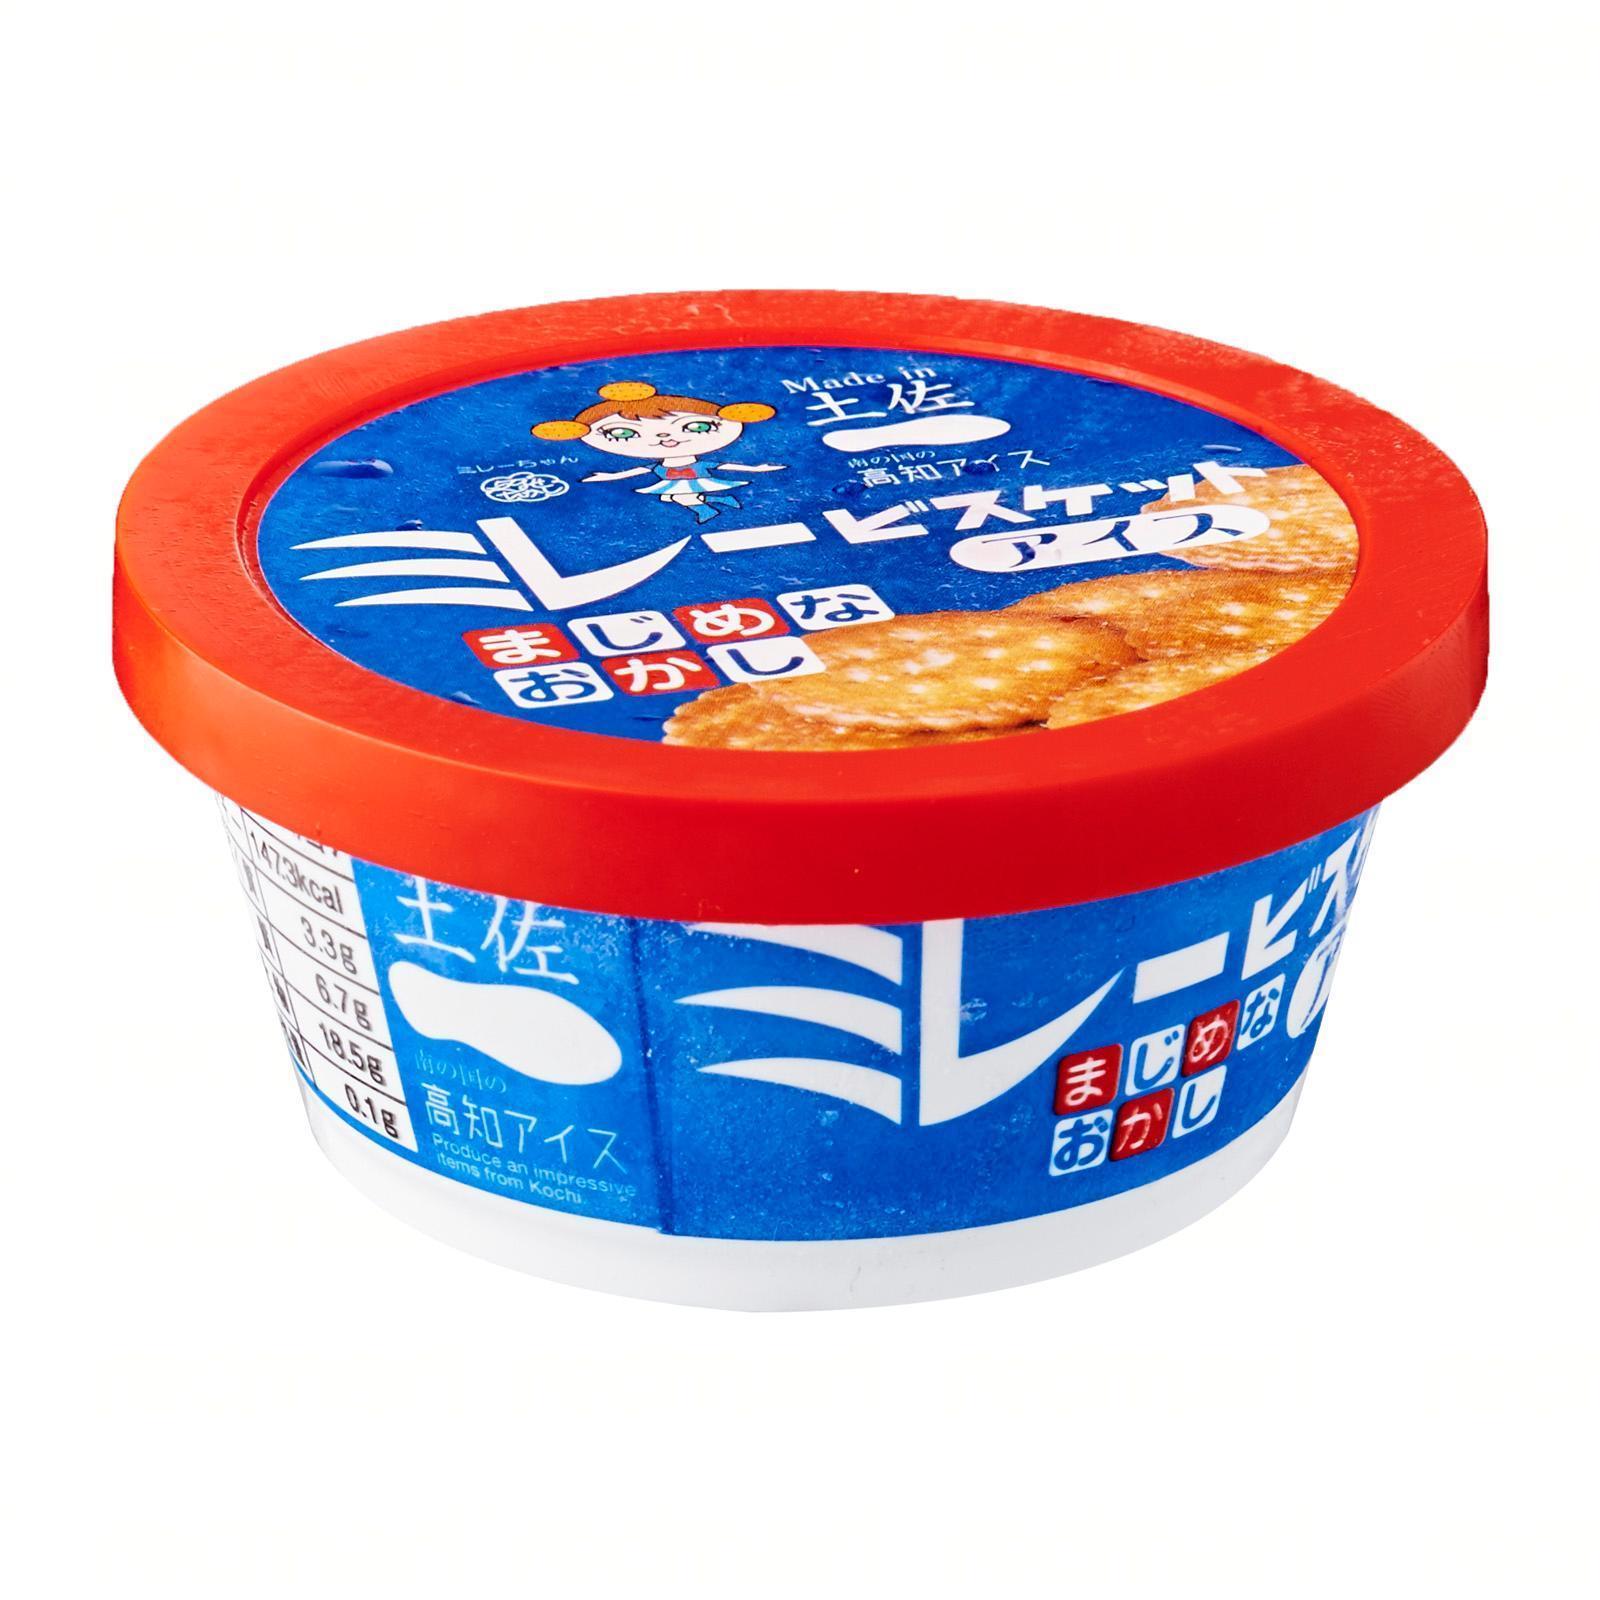 Kochi Ice Millets Milk Biscuits Ice Cream 100 ML - Kirei